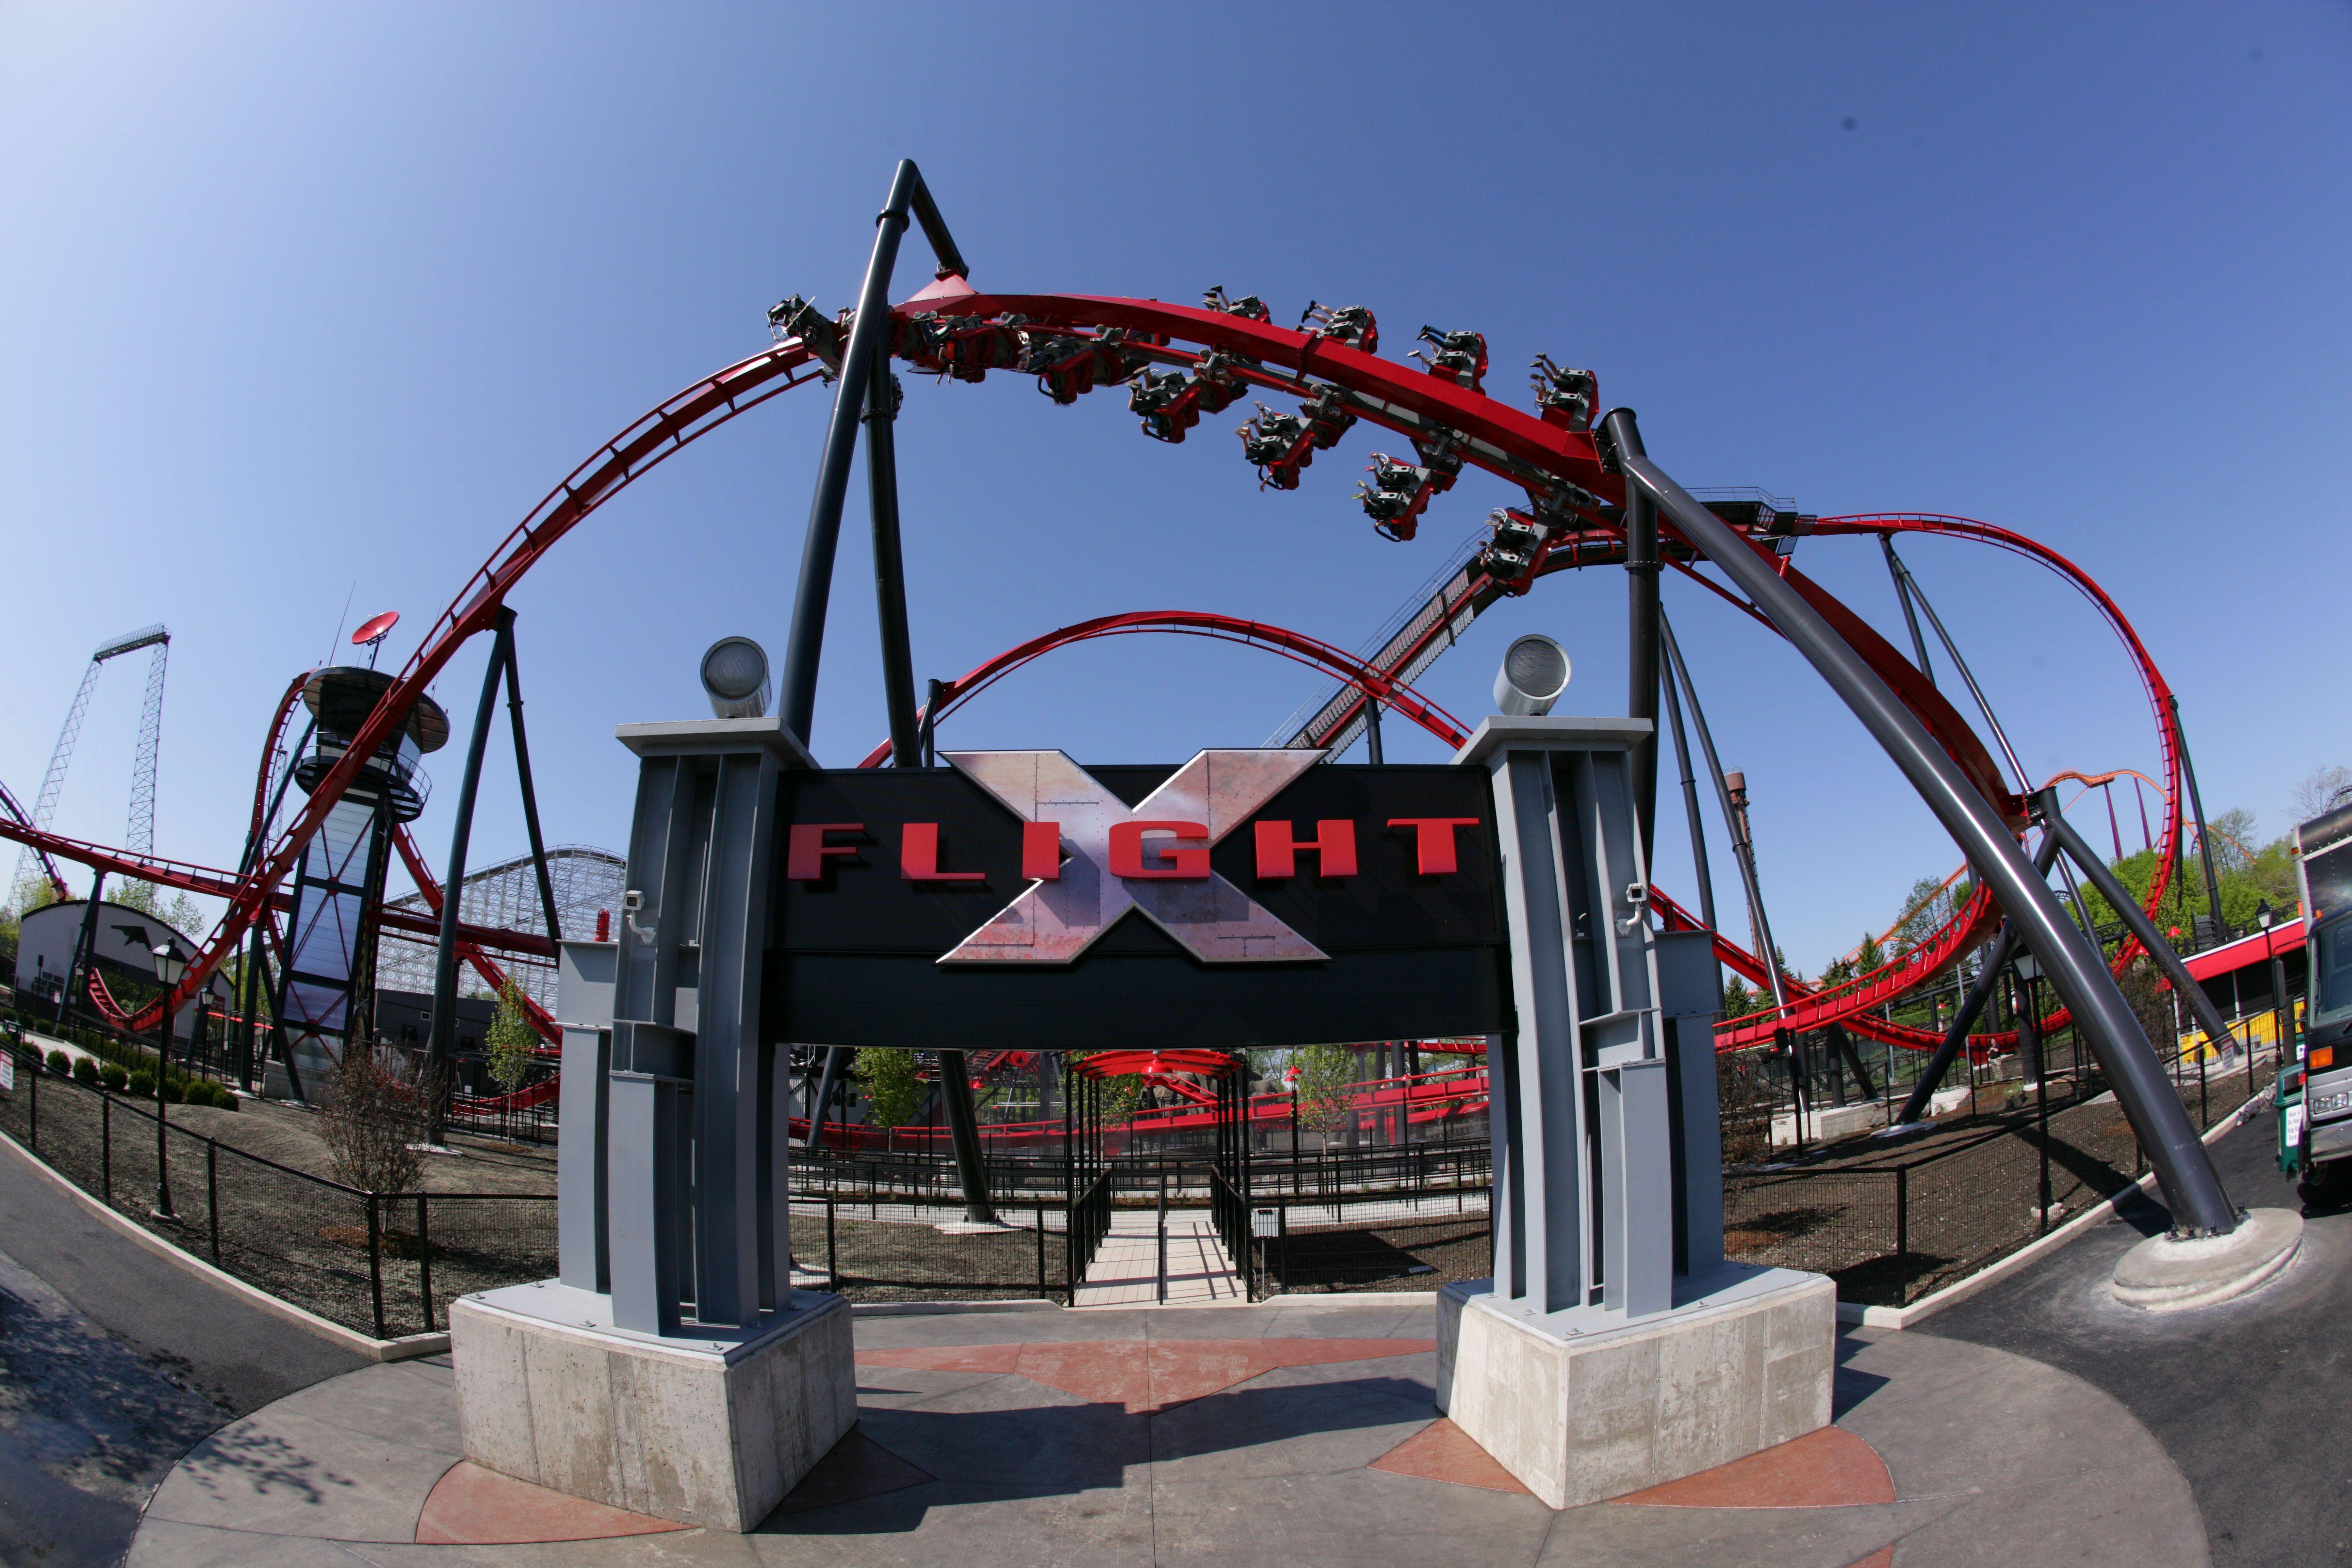 X Flight Great America Roller Coaster Six Flags